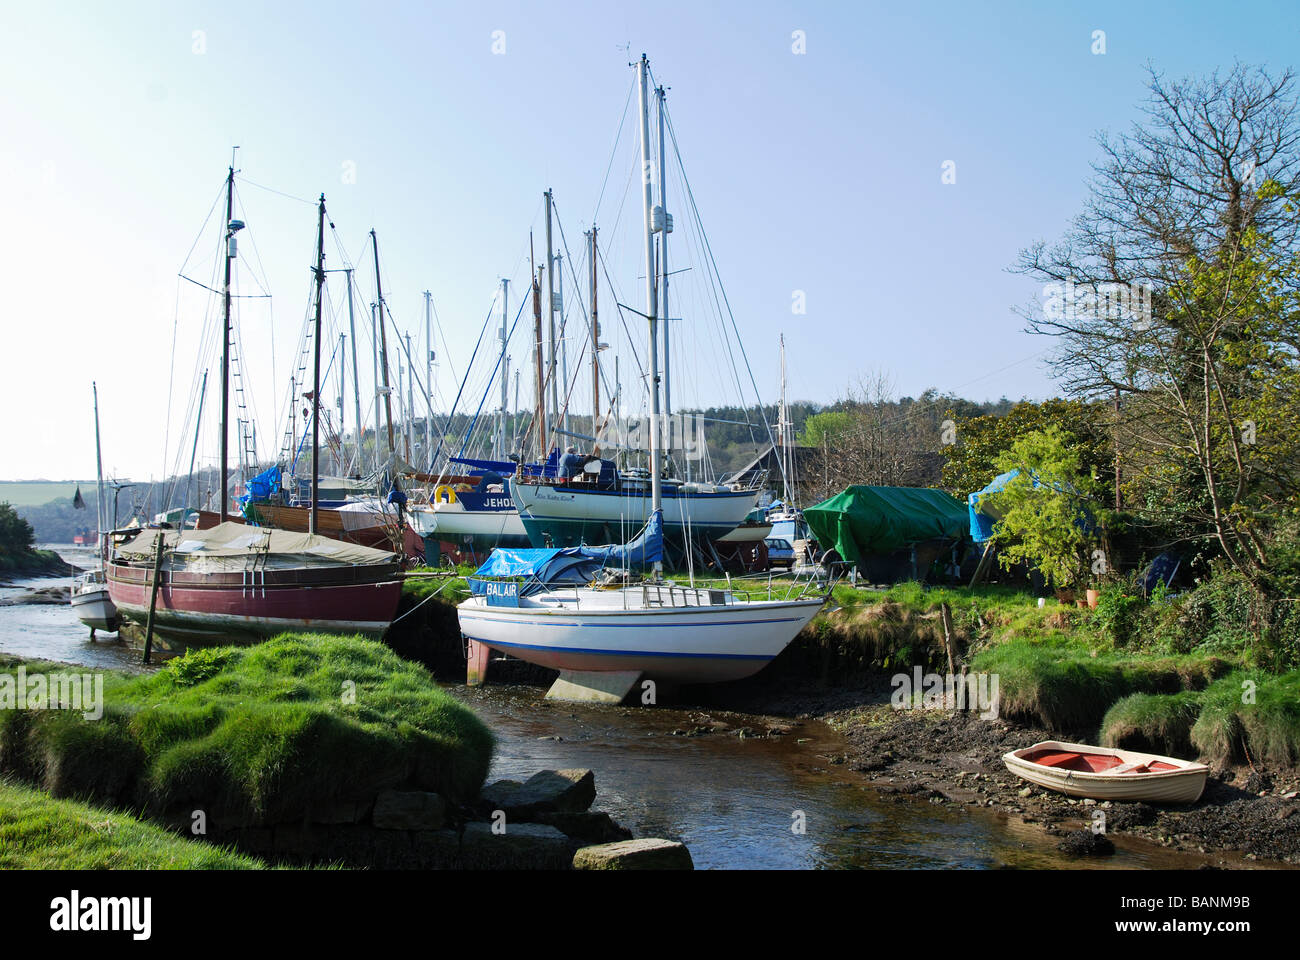 the boatyard at gweek near helston,cornwall,uk - Stock Image